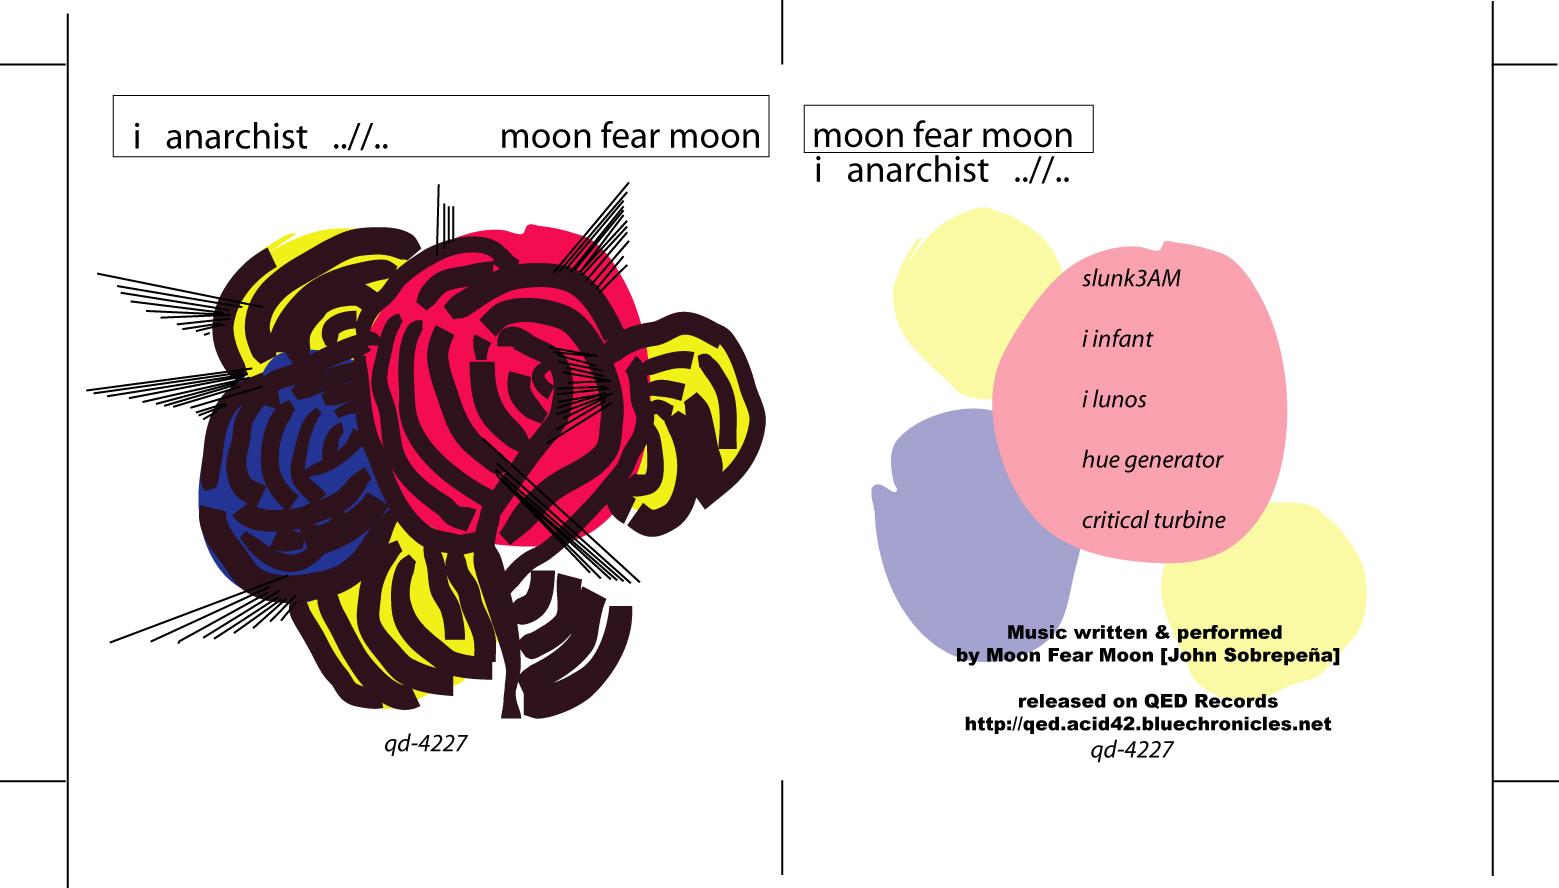 (qd-4227) Moon Fear Moon - i anarchist